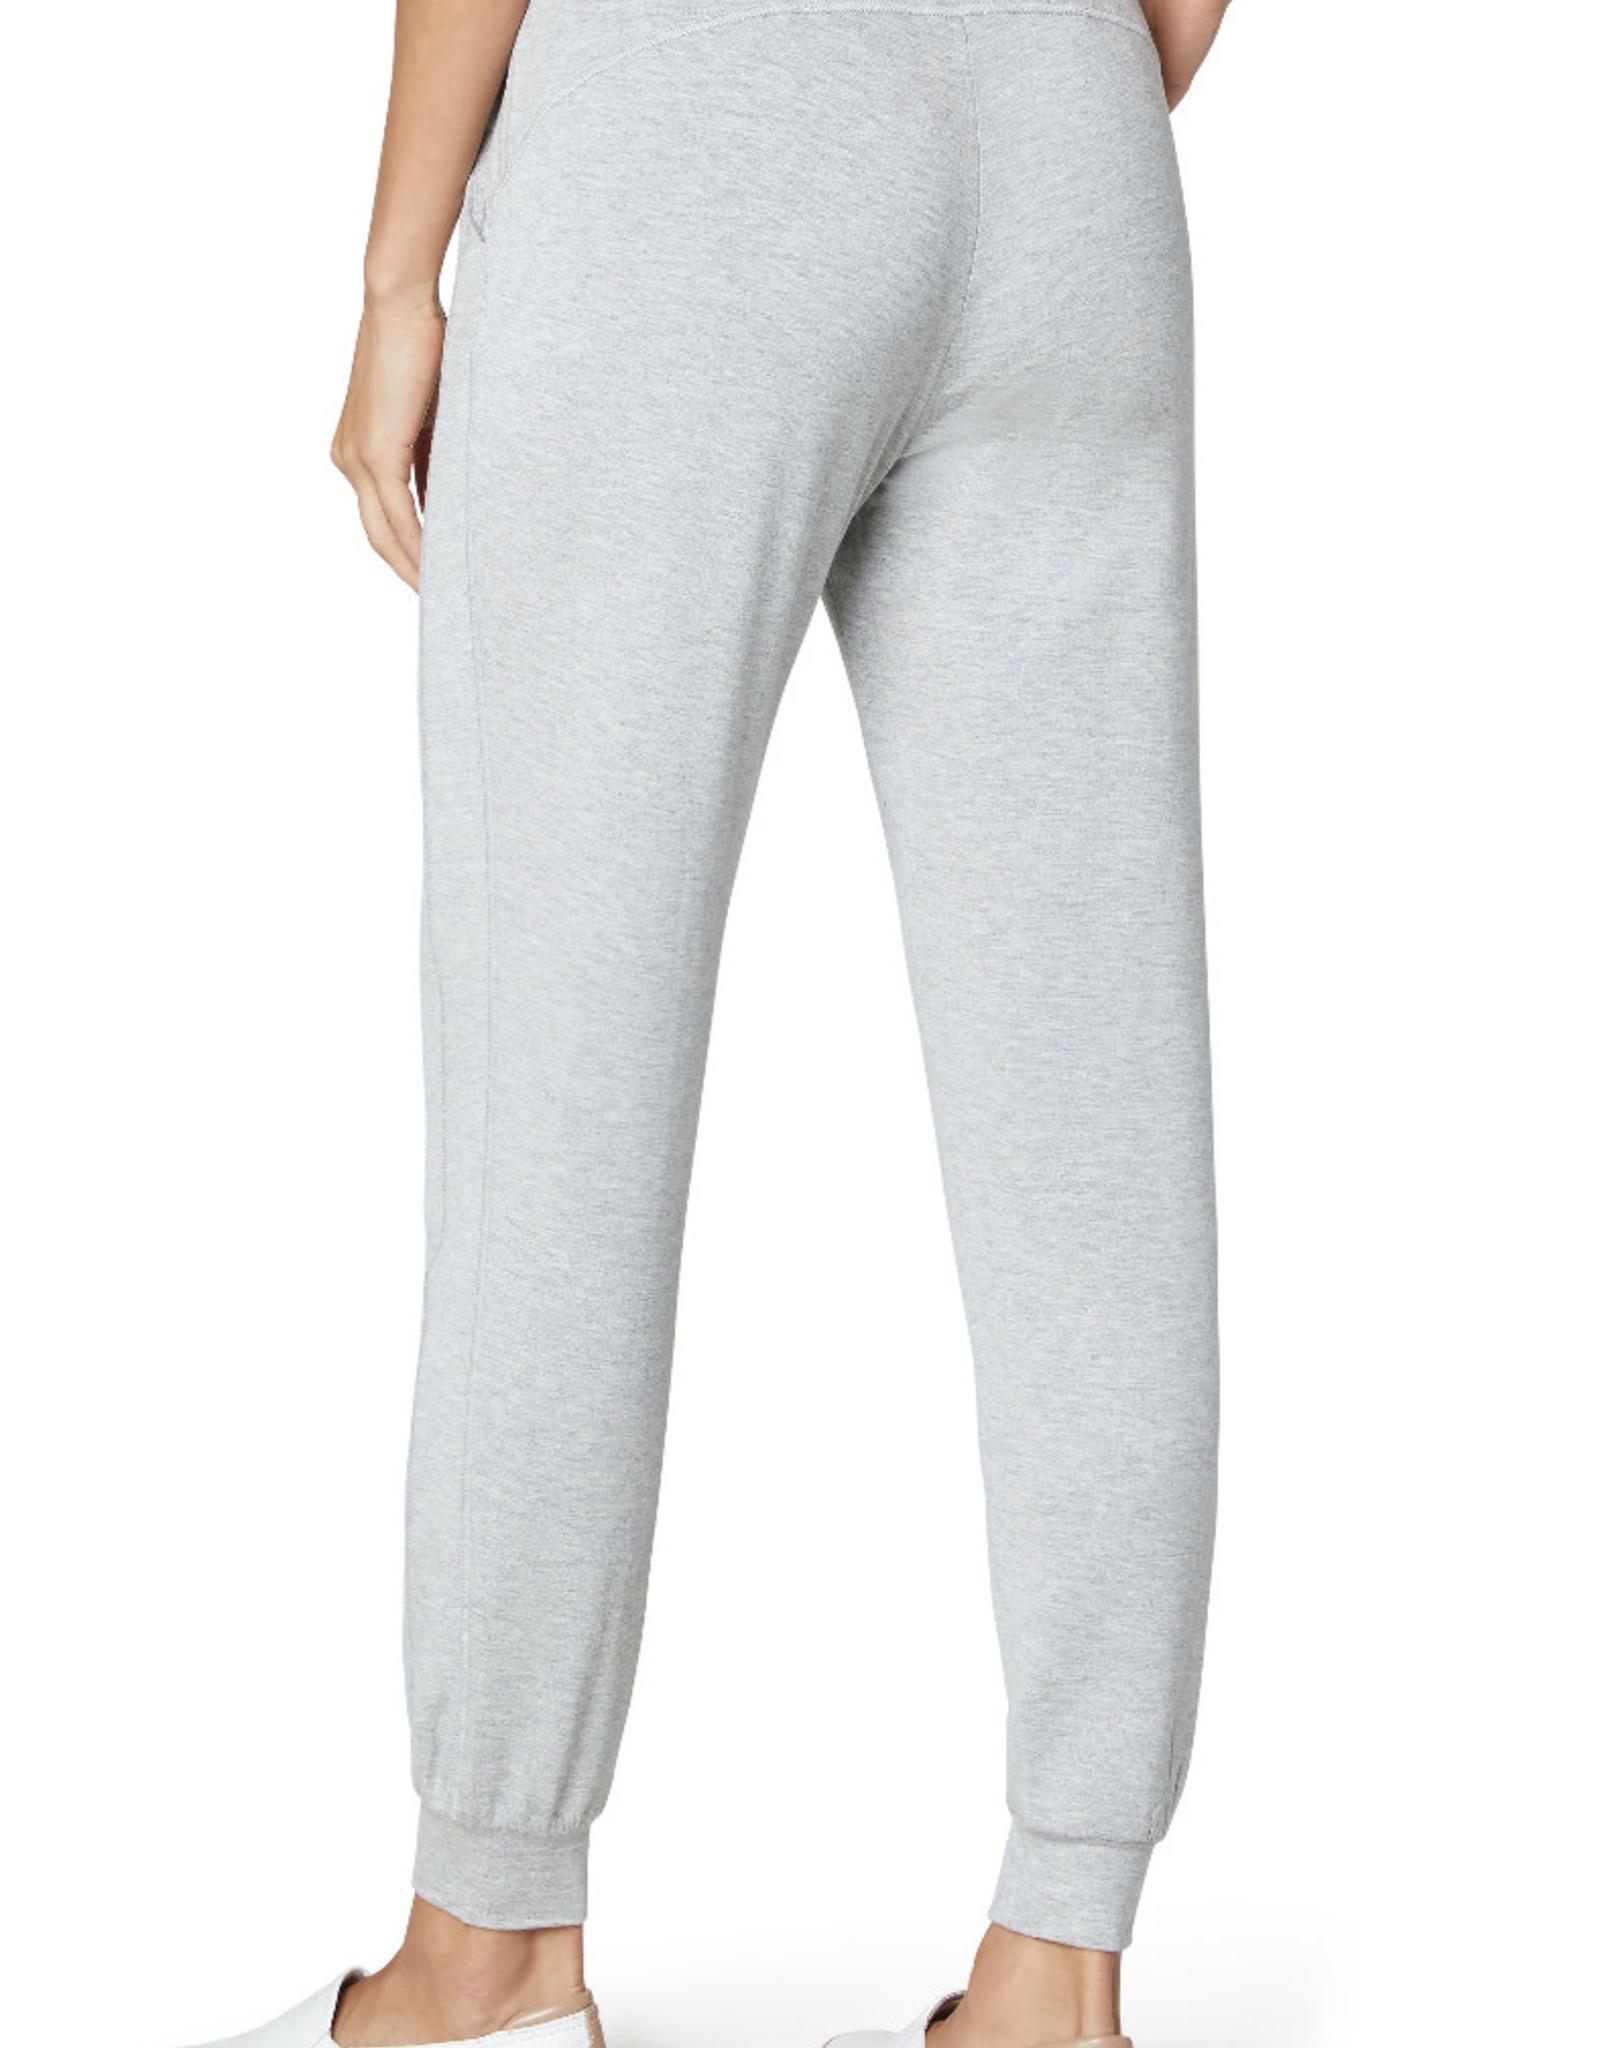 Liverpool Soft jogger pant- Grey